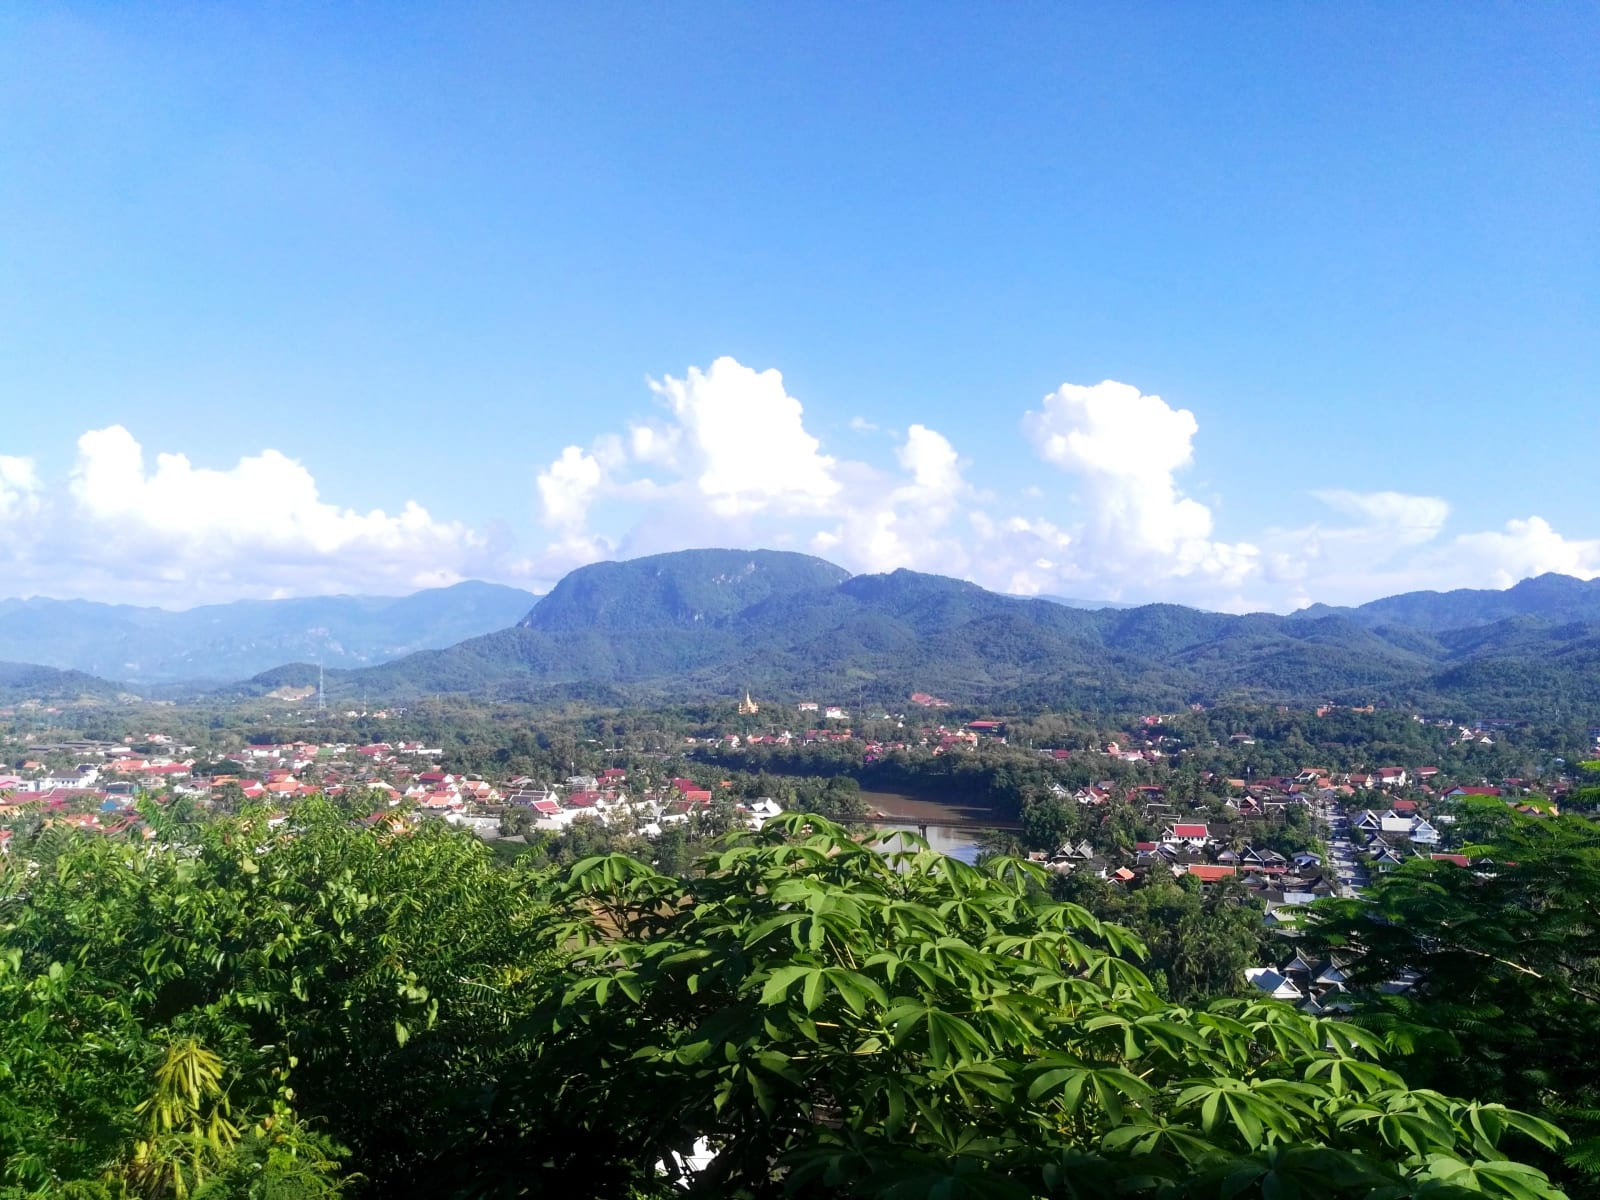 Výhled na Mekong z Mount Phousi, Luang Prabang, Laos